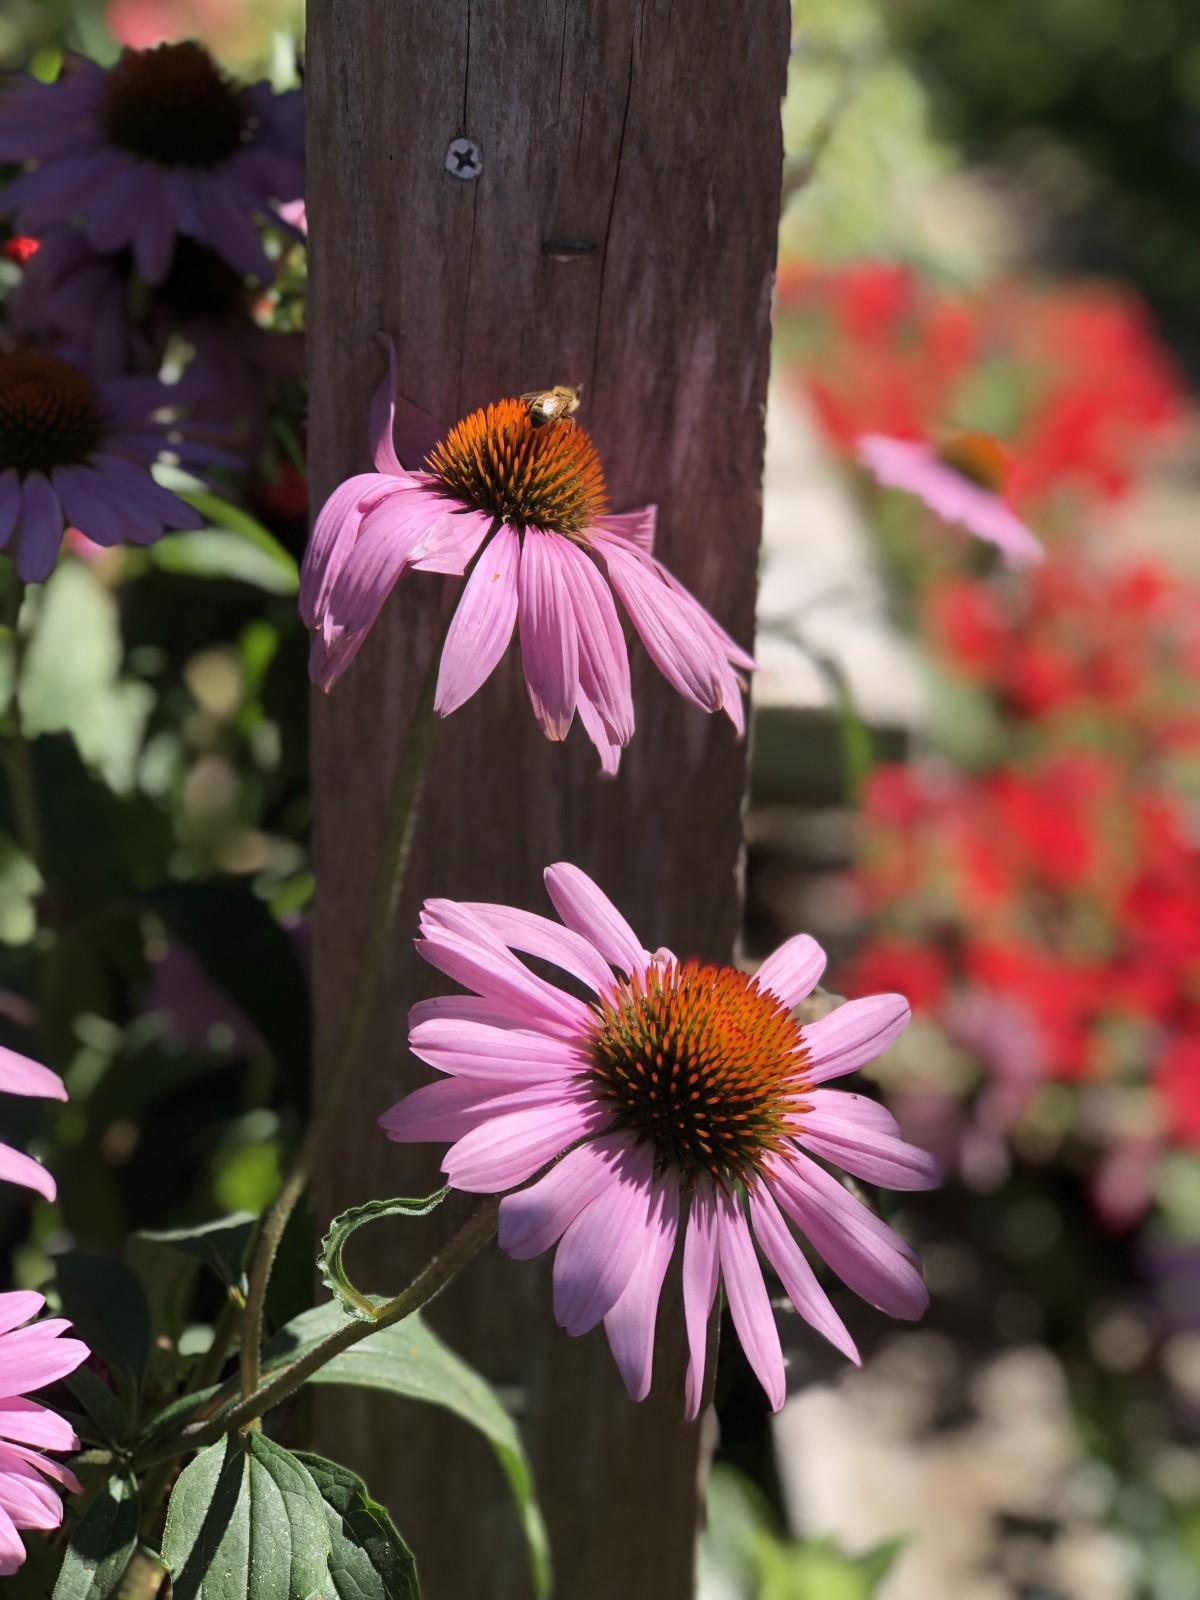 Free images flower stem bumblebee honey bee pink magenta flower stem bee bumblebee honey bee pink magenta wood post garden plant flora coneflower flowering plant mightylinksfo